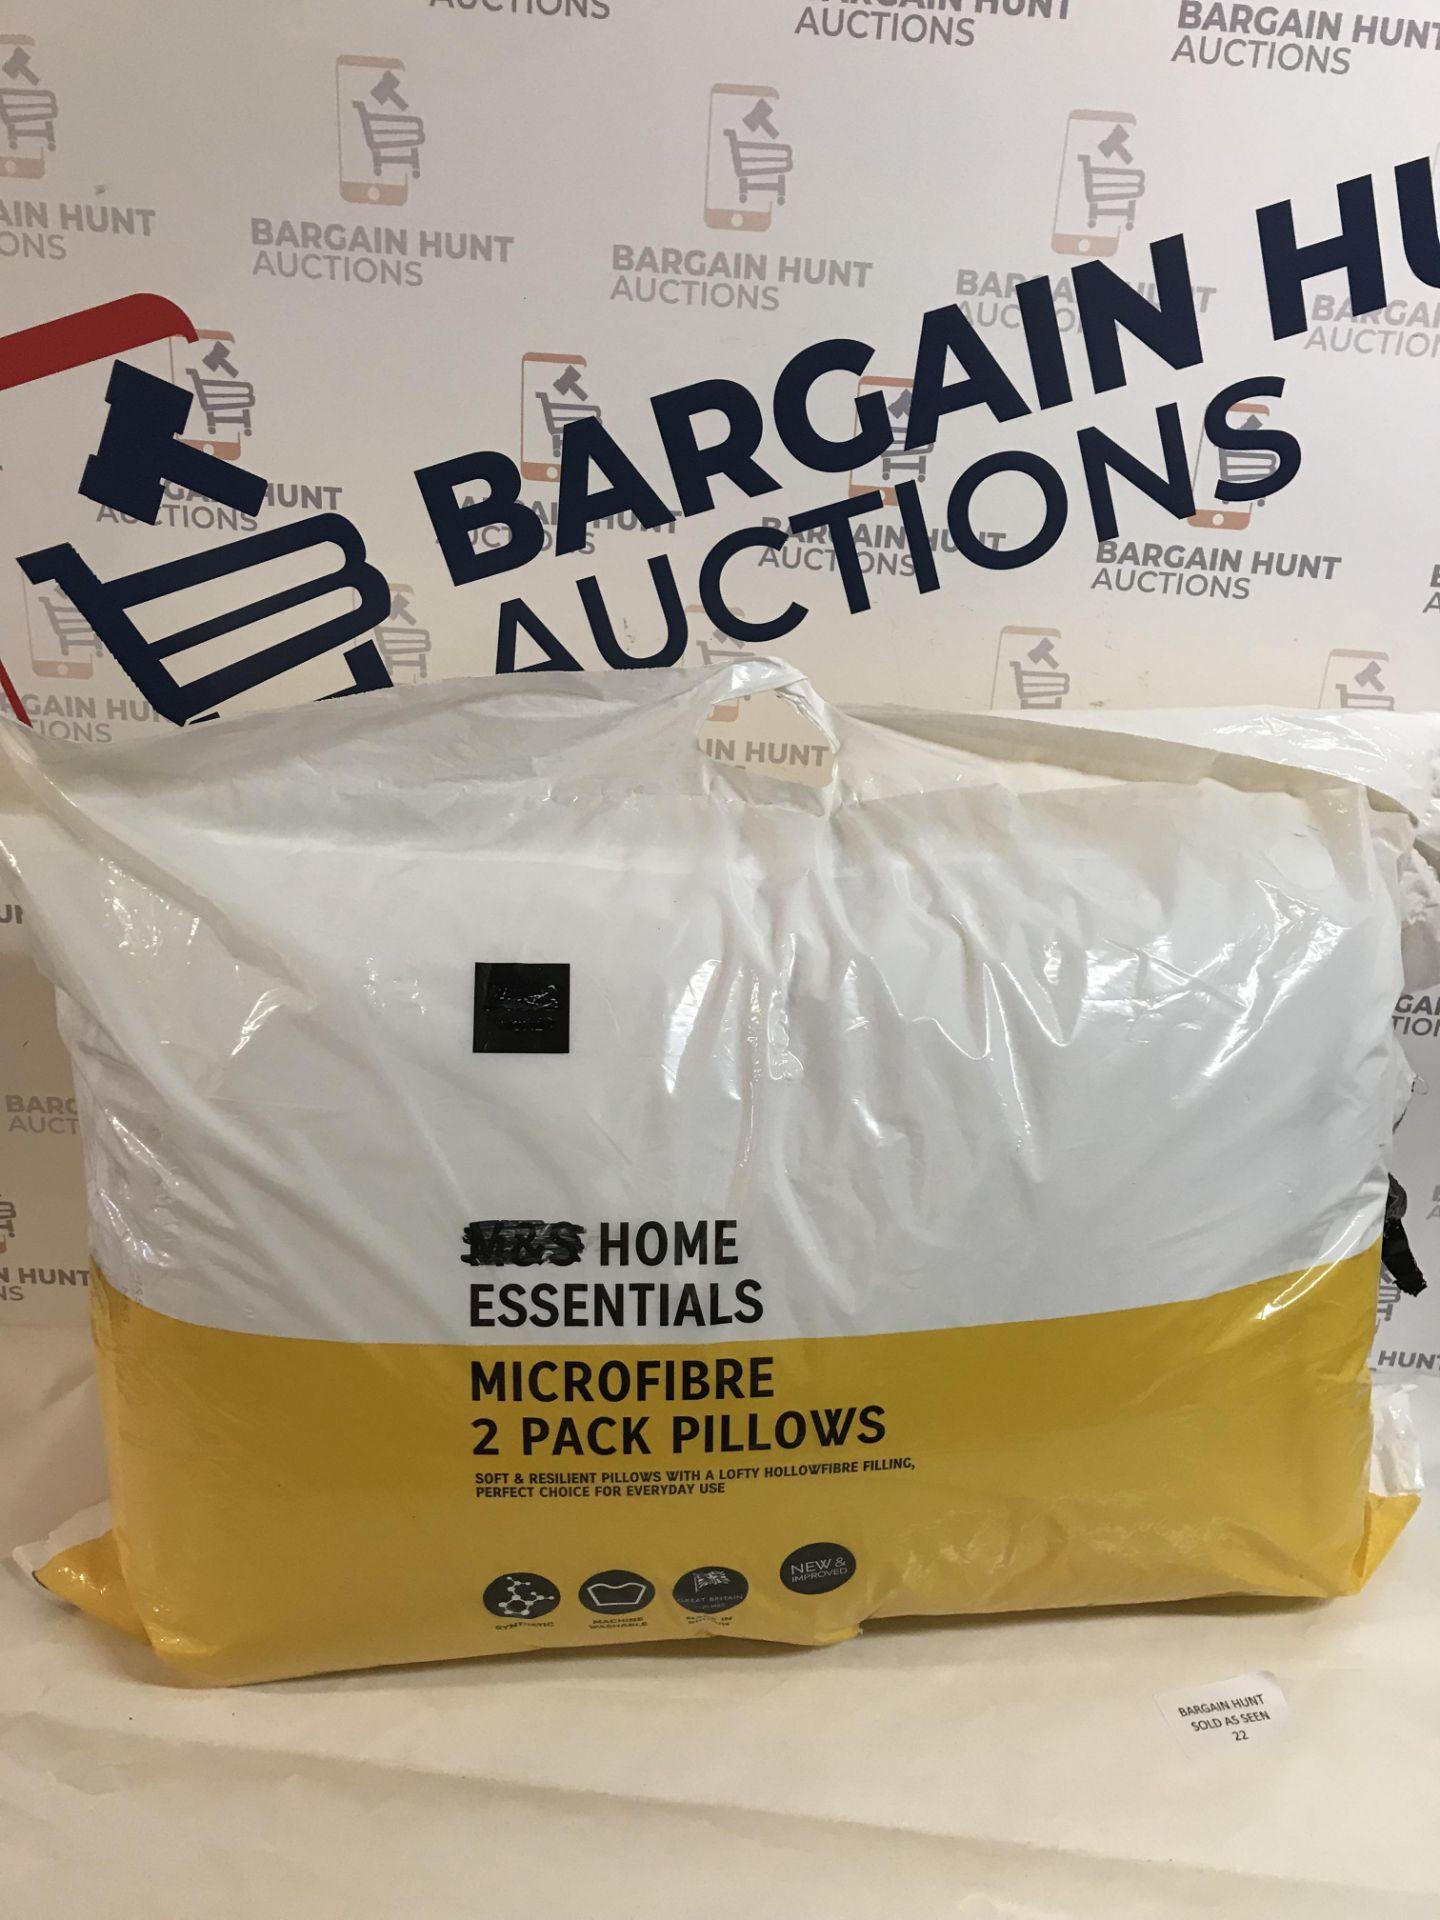 Lot 22 - Microfibre 2 Pack Pillows